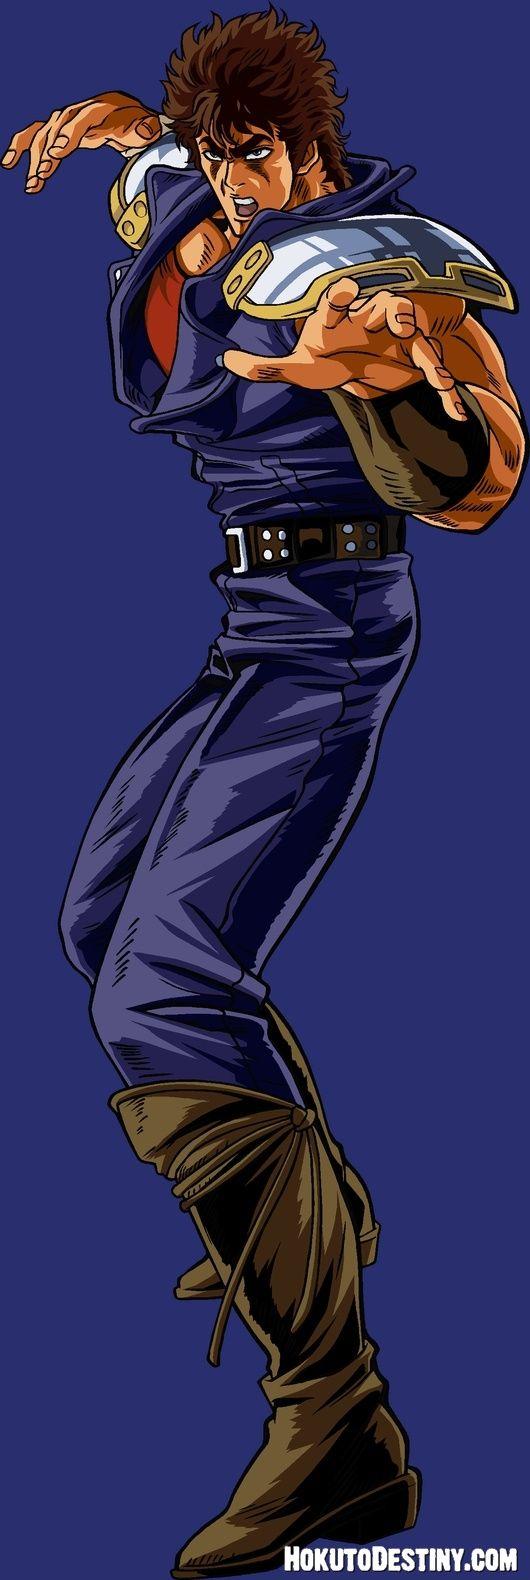 Kenshiro from Hokuto no Ken/ Fist of the North Star.